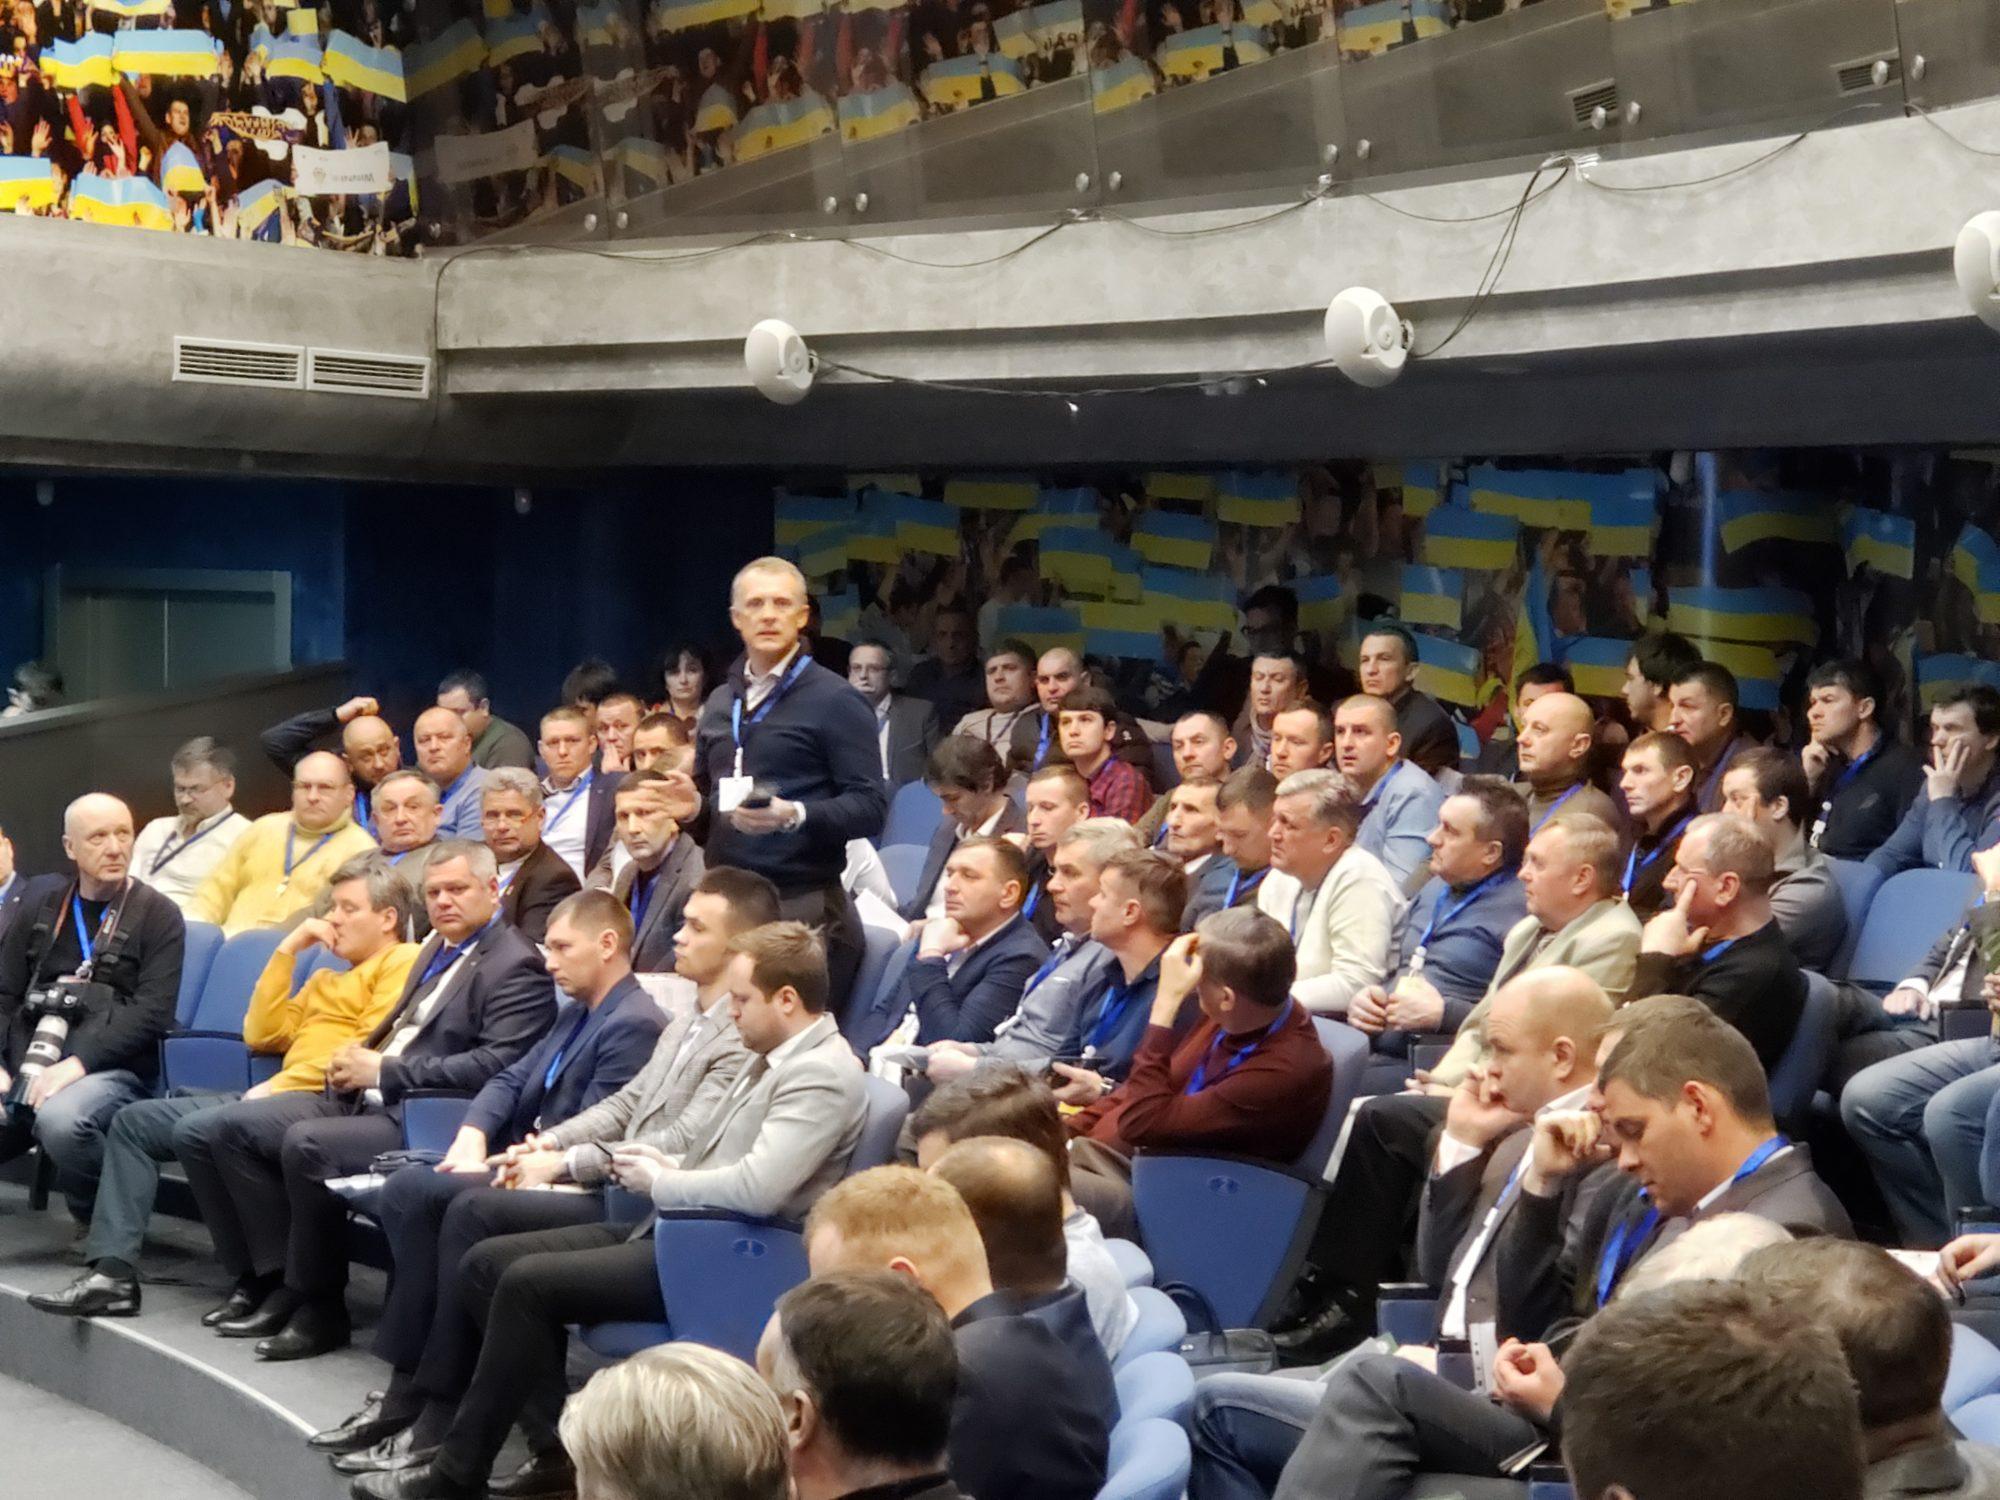 Обрано нового очільника Київщини футбольної -  - 20200118 113137 2000x1500